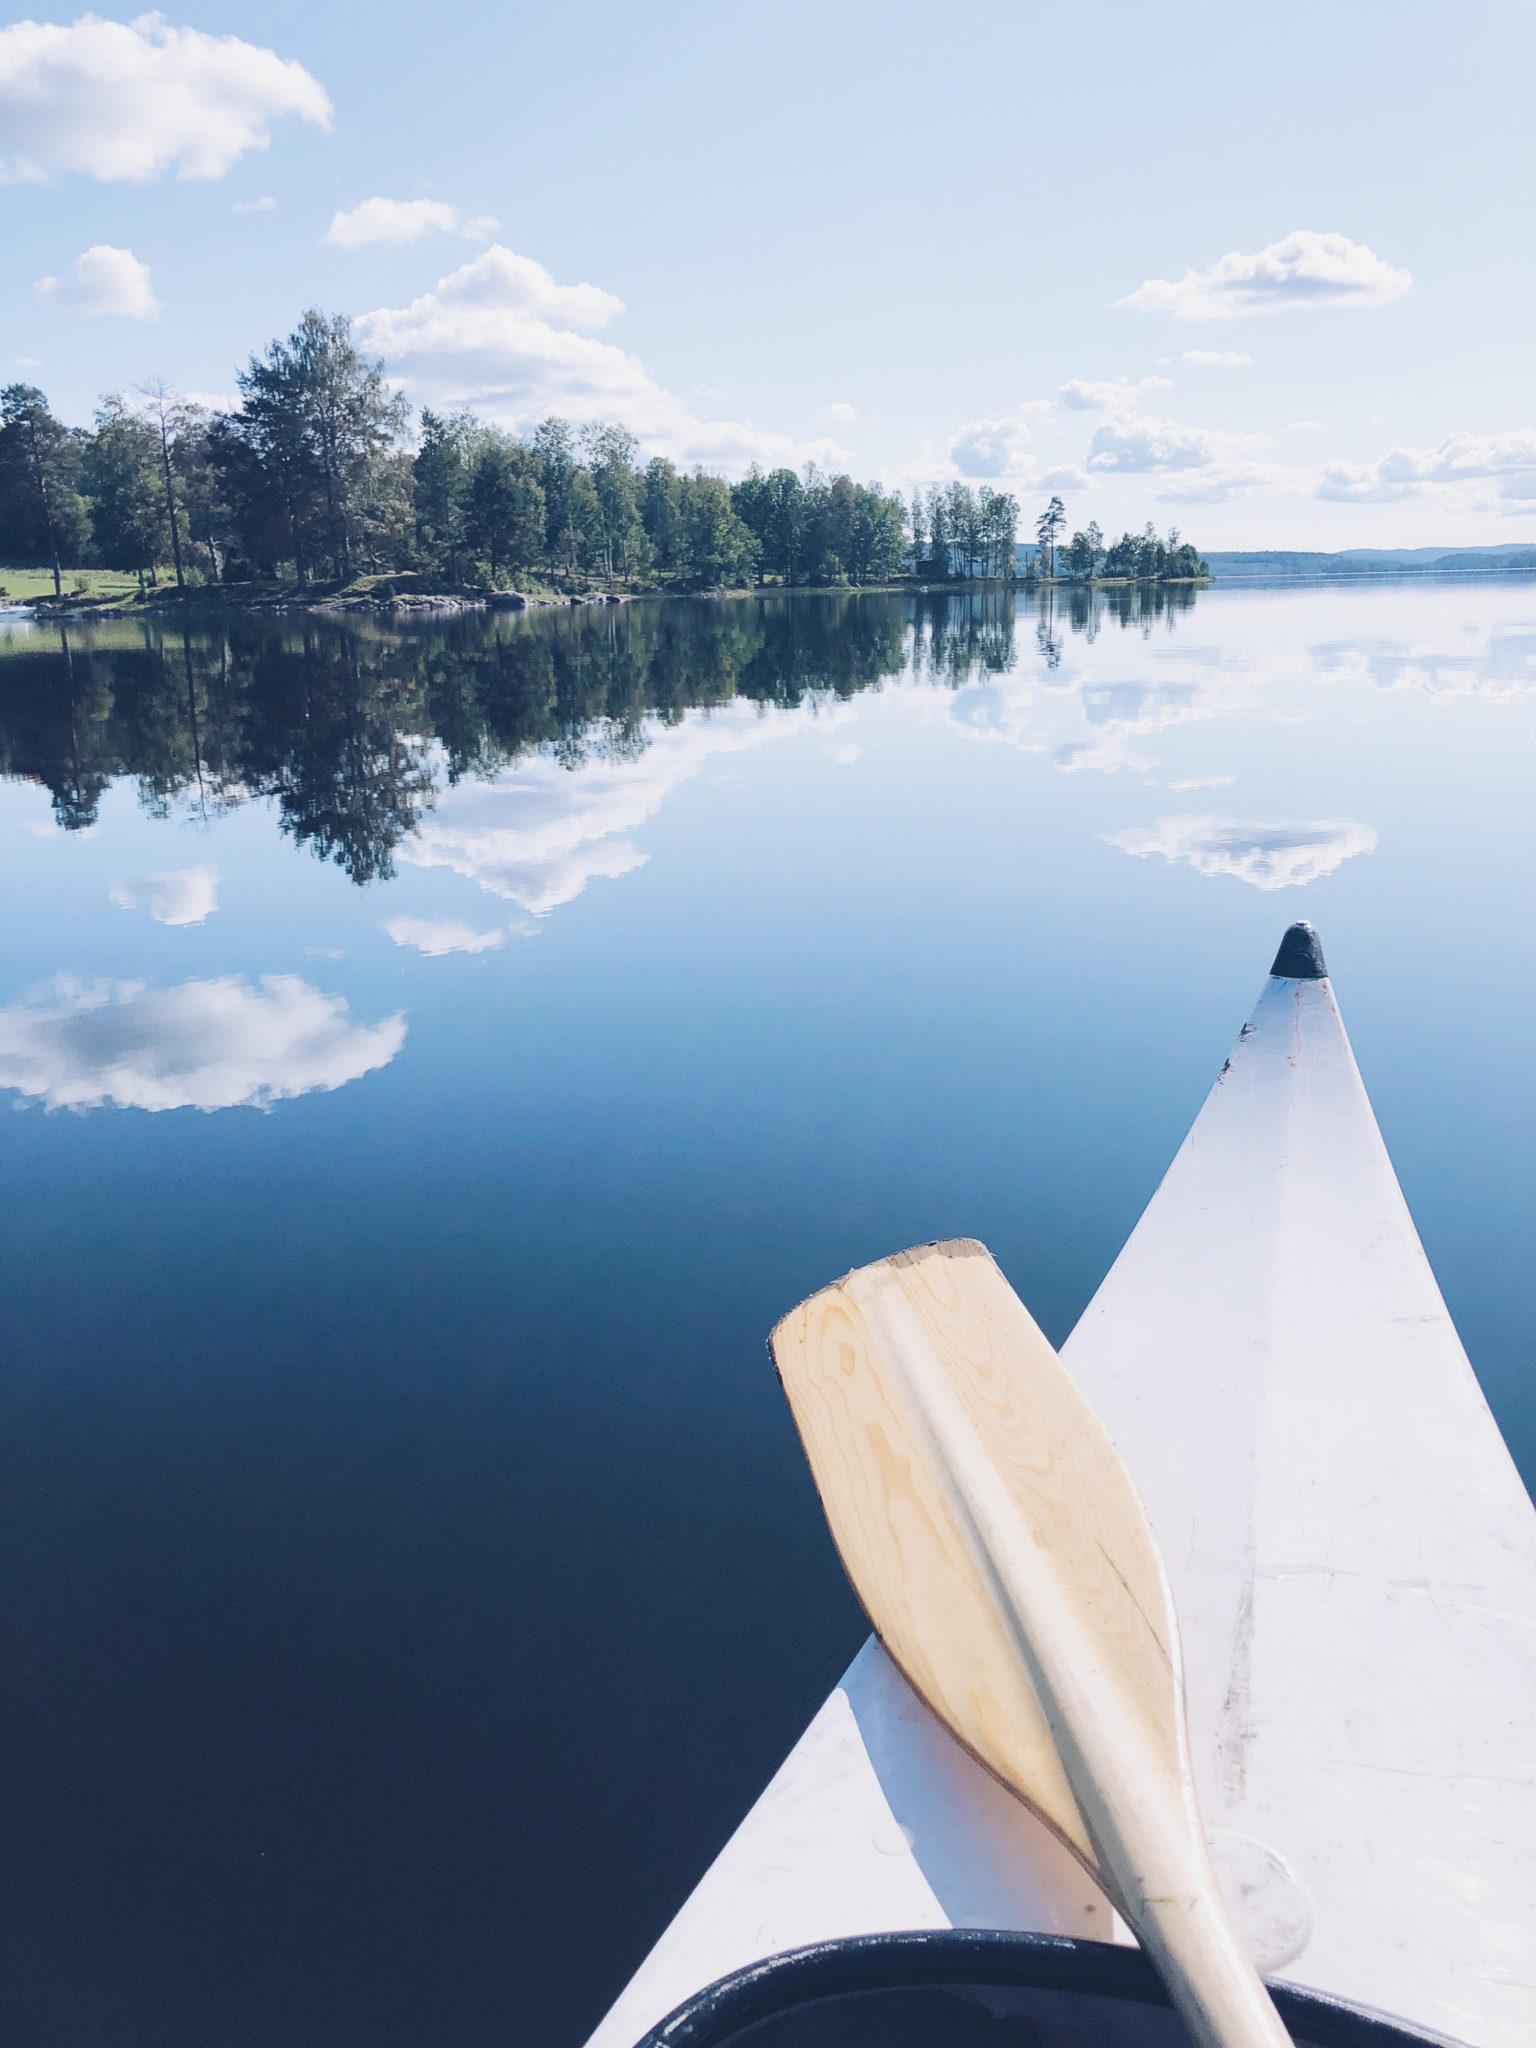 kano i sverige - naturbyn